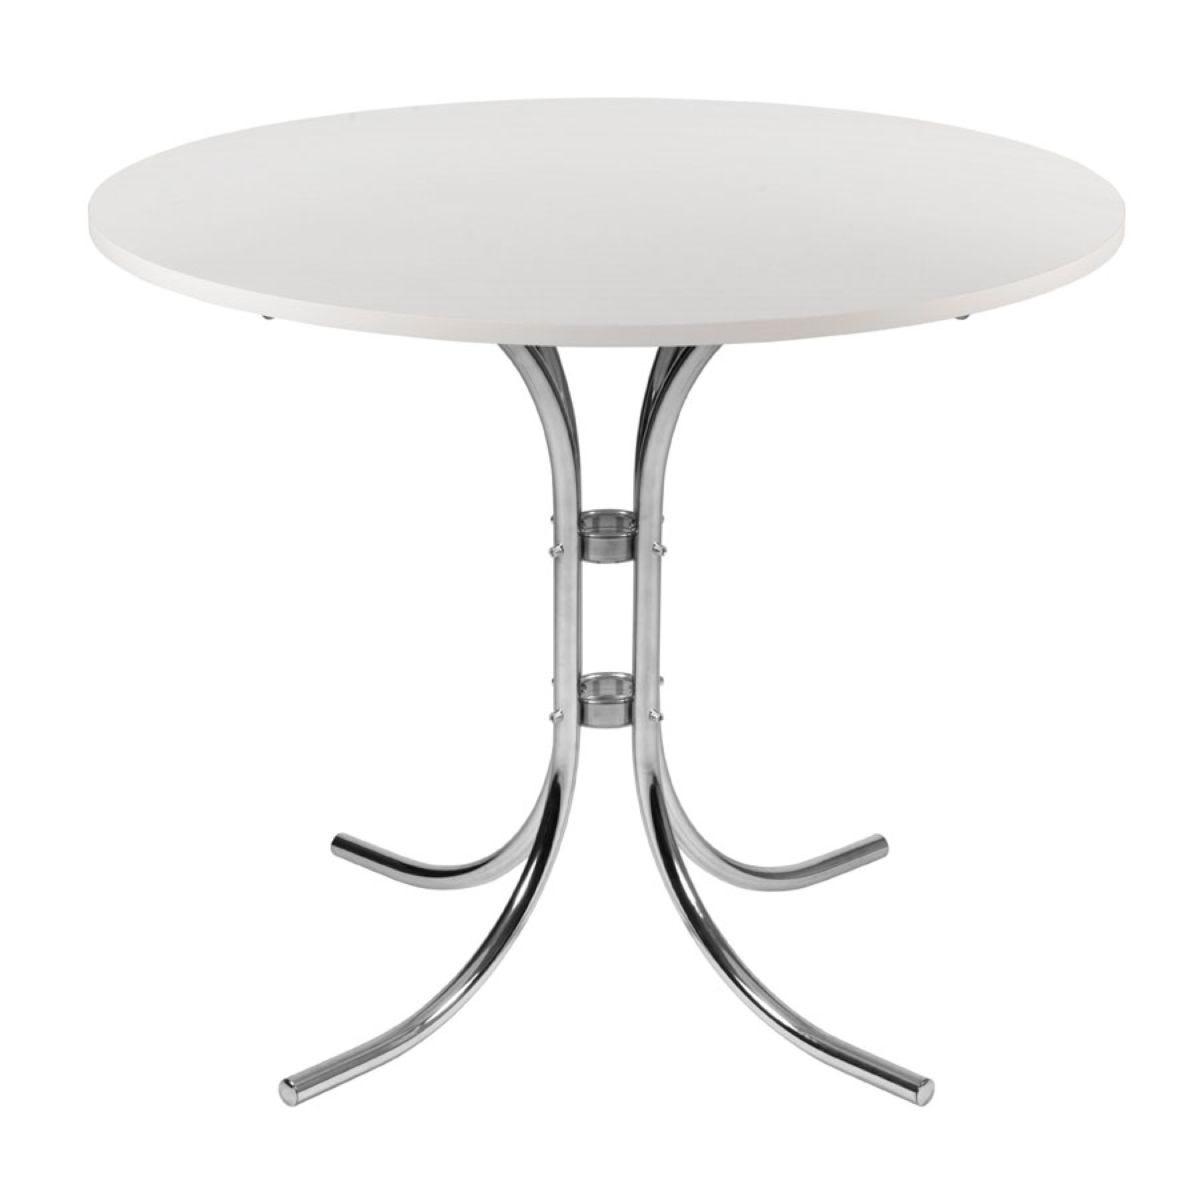 Teknik Bistro Table with Wipe-Clean Top